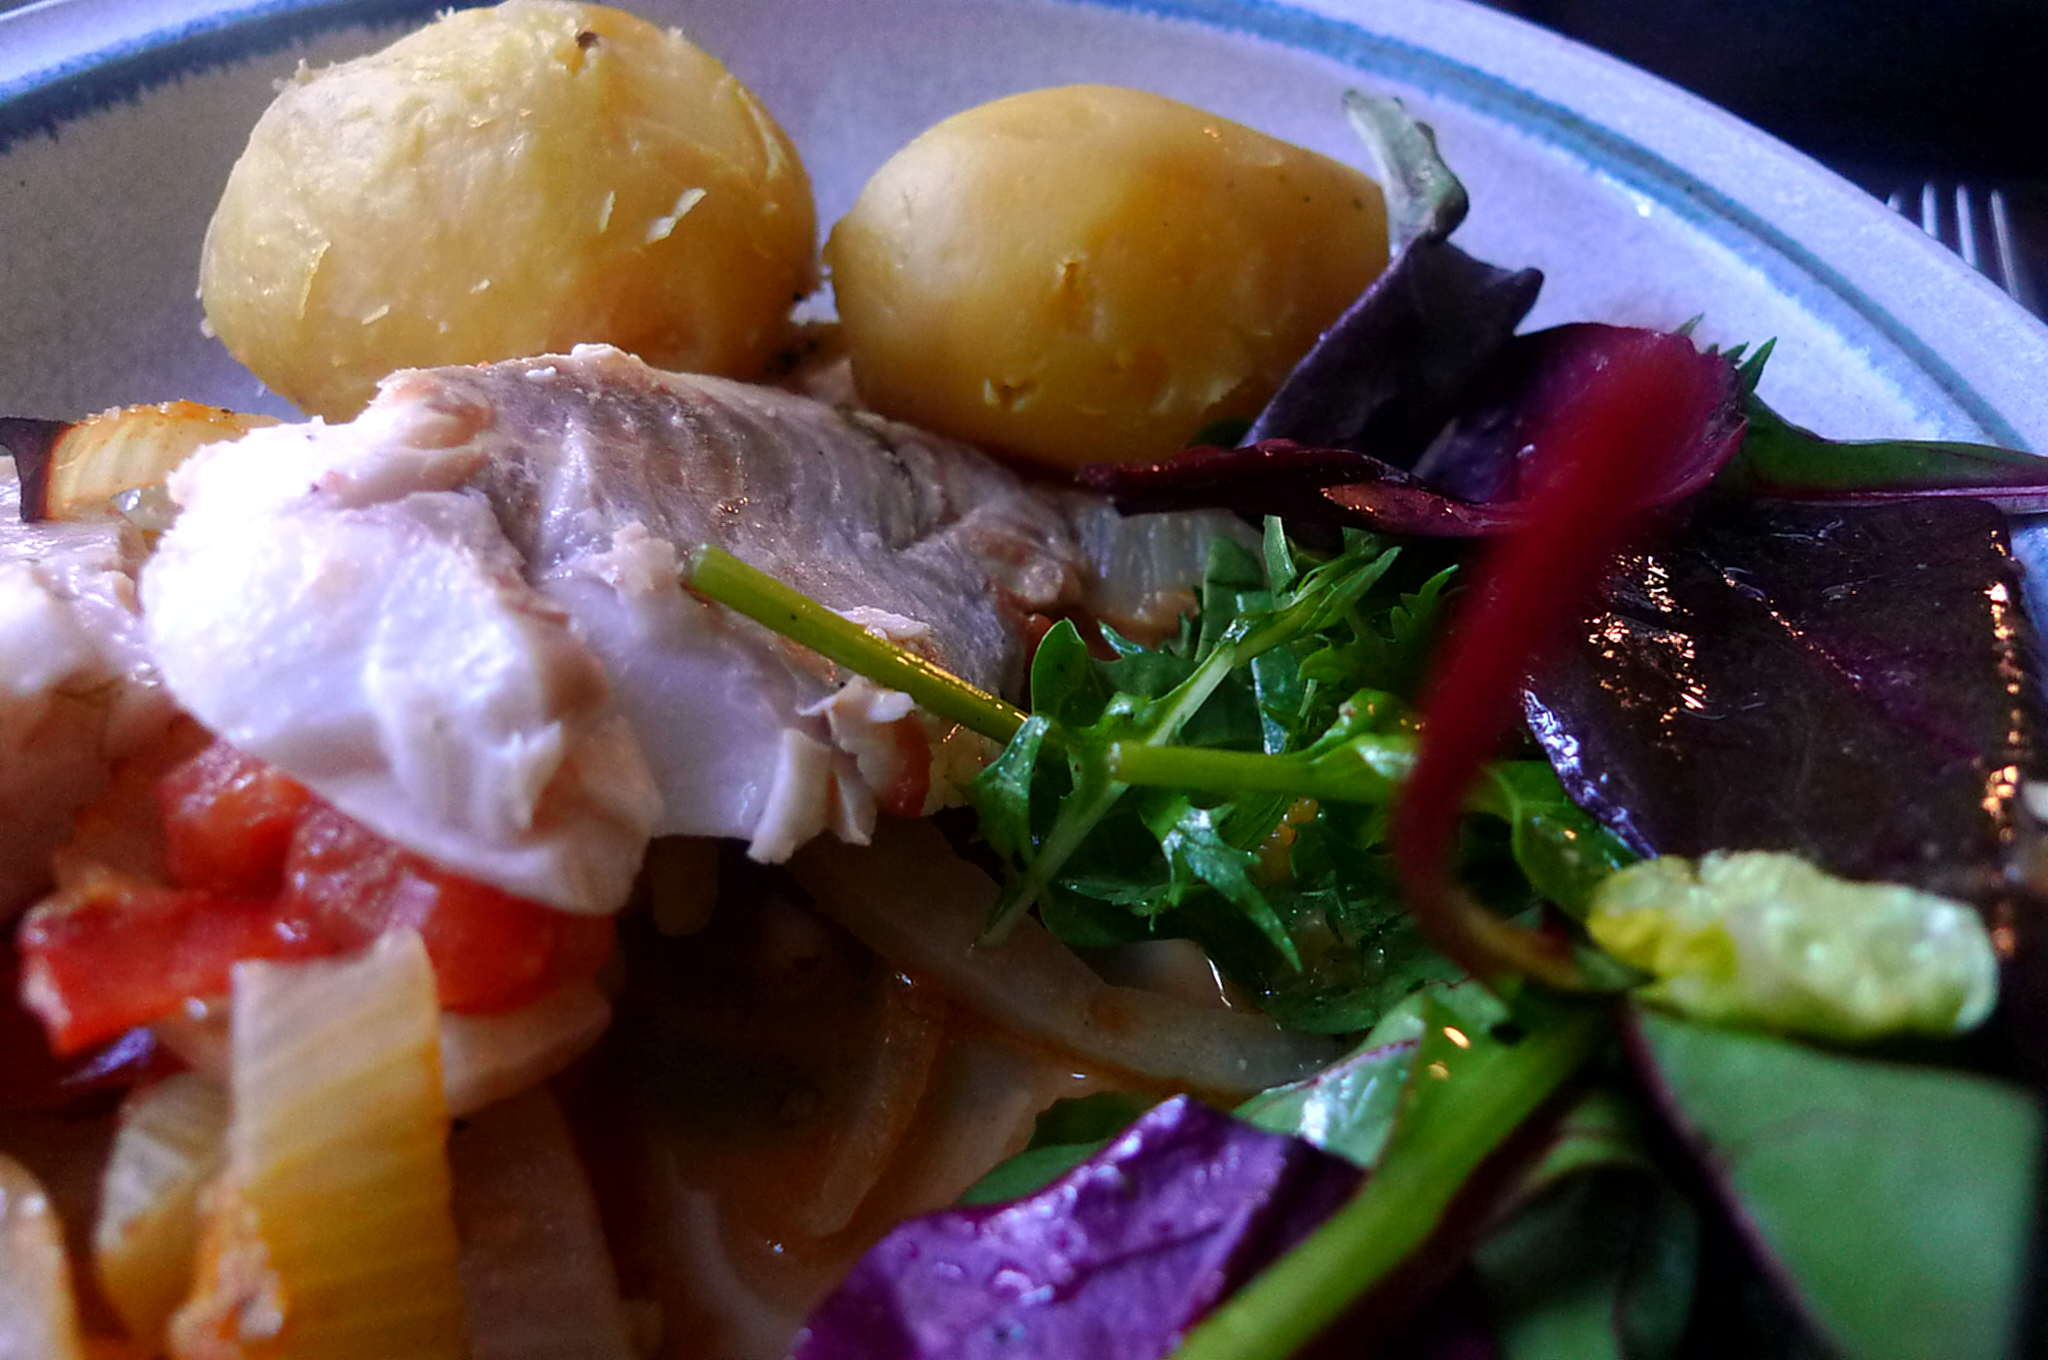 8.2.16 - Rotbarsch,Fenchel,Kartoffel,Salat,pescetarisch (2)